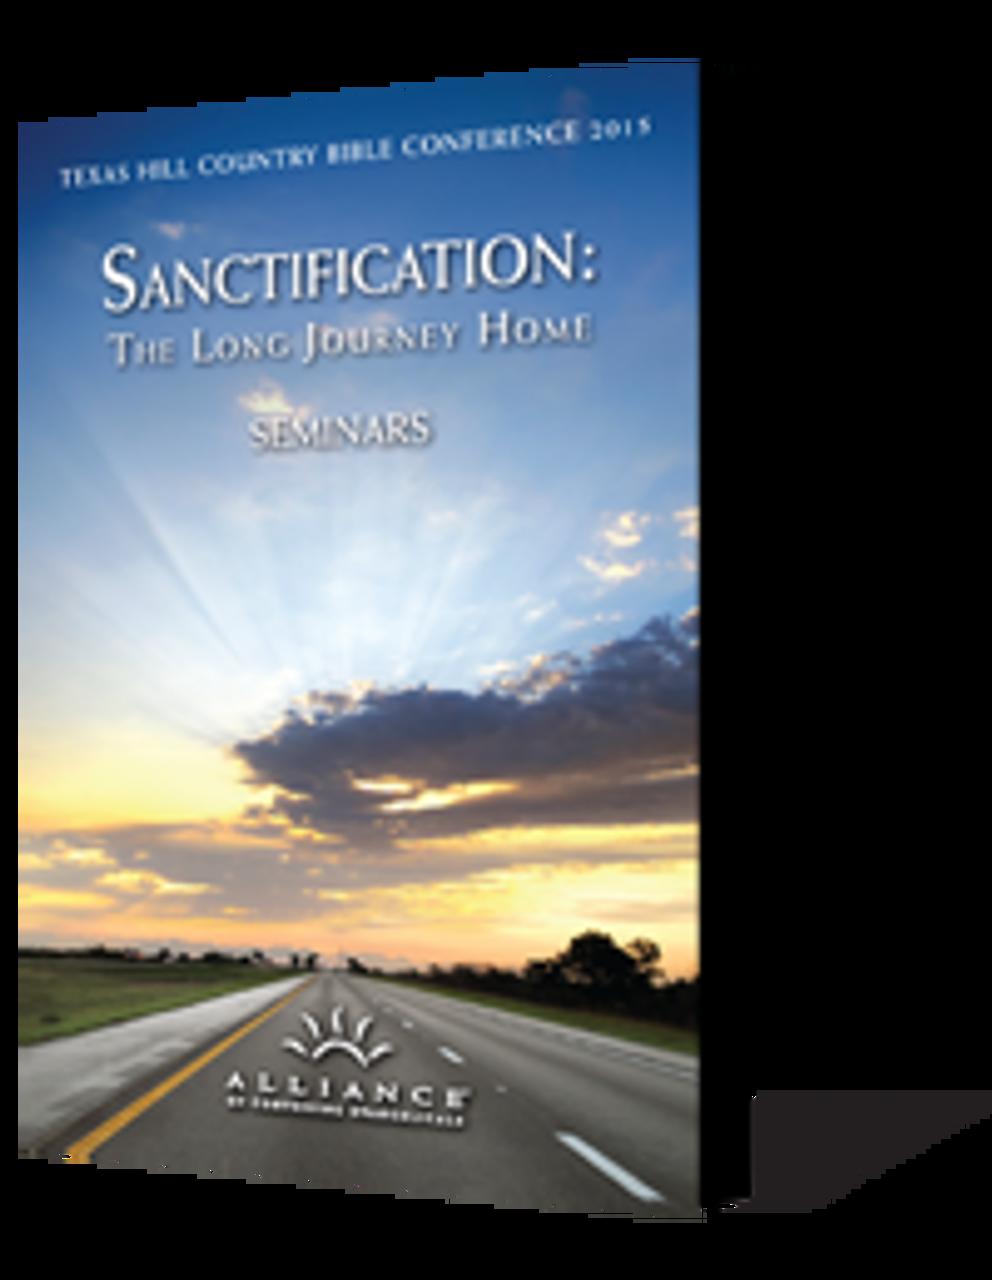 Sanctification: The Long Journey Home - Seminars (mp3 Disc)